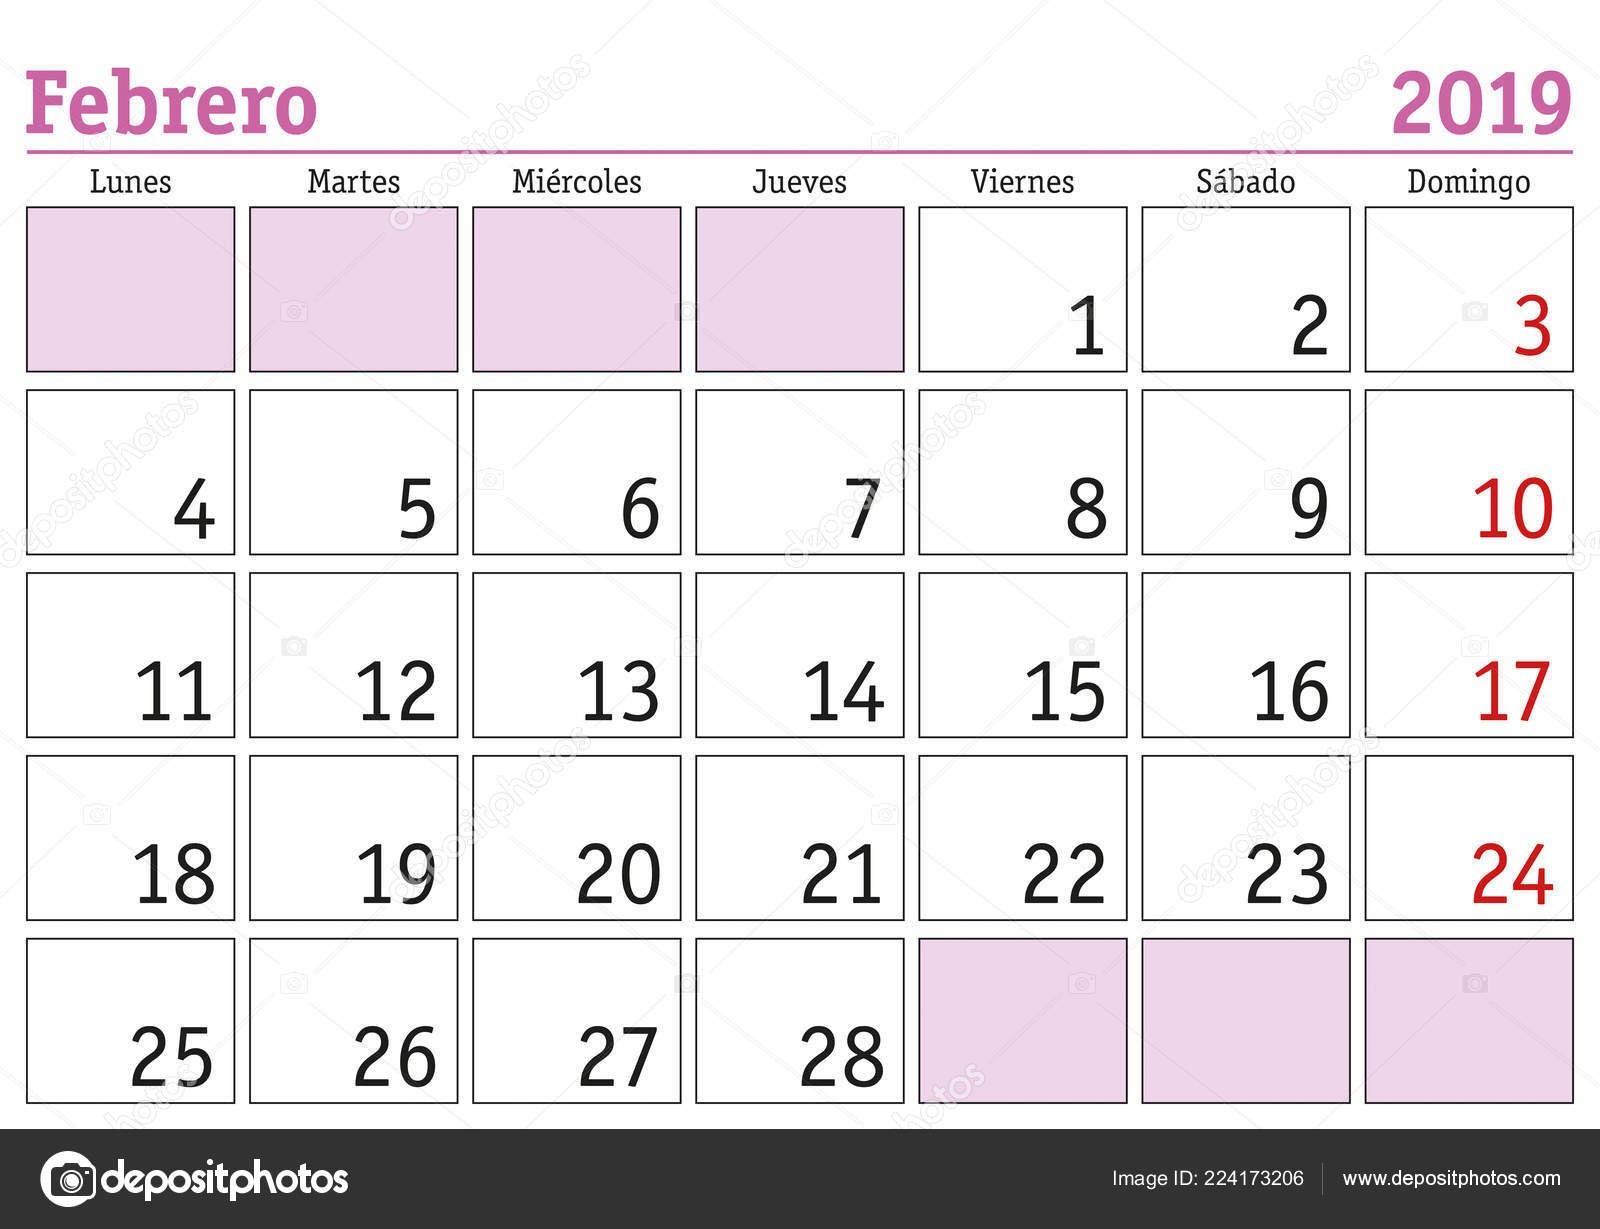 Calendario 2019 Brasil.com.br Más Populares Měsc šnor Roce 2019 Nástěnn½ Kalendář ÅpanělÅ¡tině Febrero 2019 Of Calendario 2019 Brasil.com.br Más Recientemente Liberado Tips associated with Calendario 2018 Calendar Online 2019